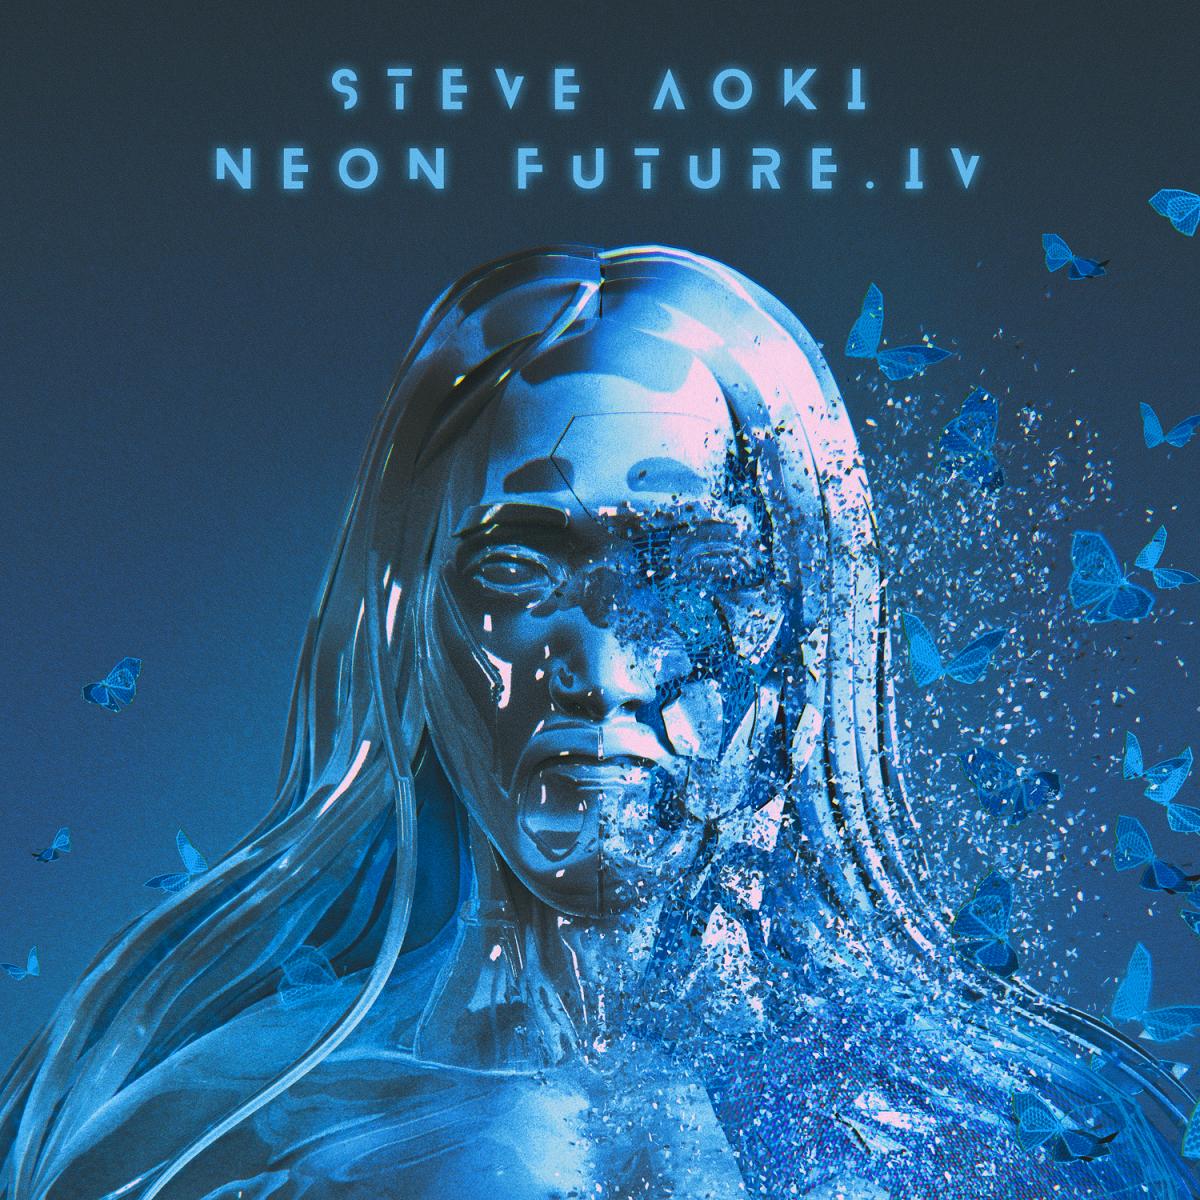 Steve Aoki Neon Future IV Cover Art